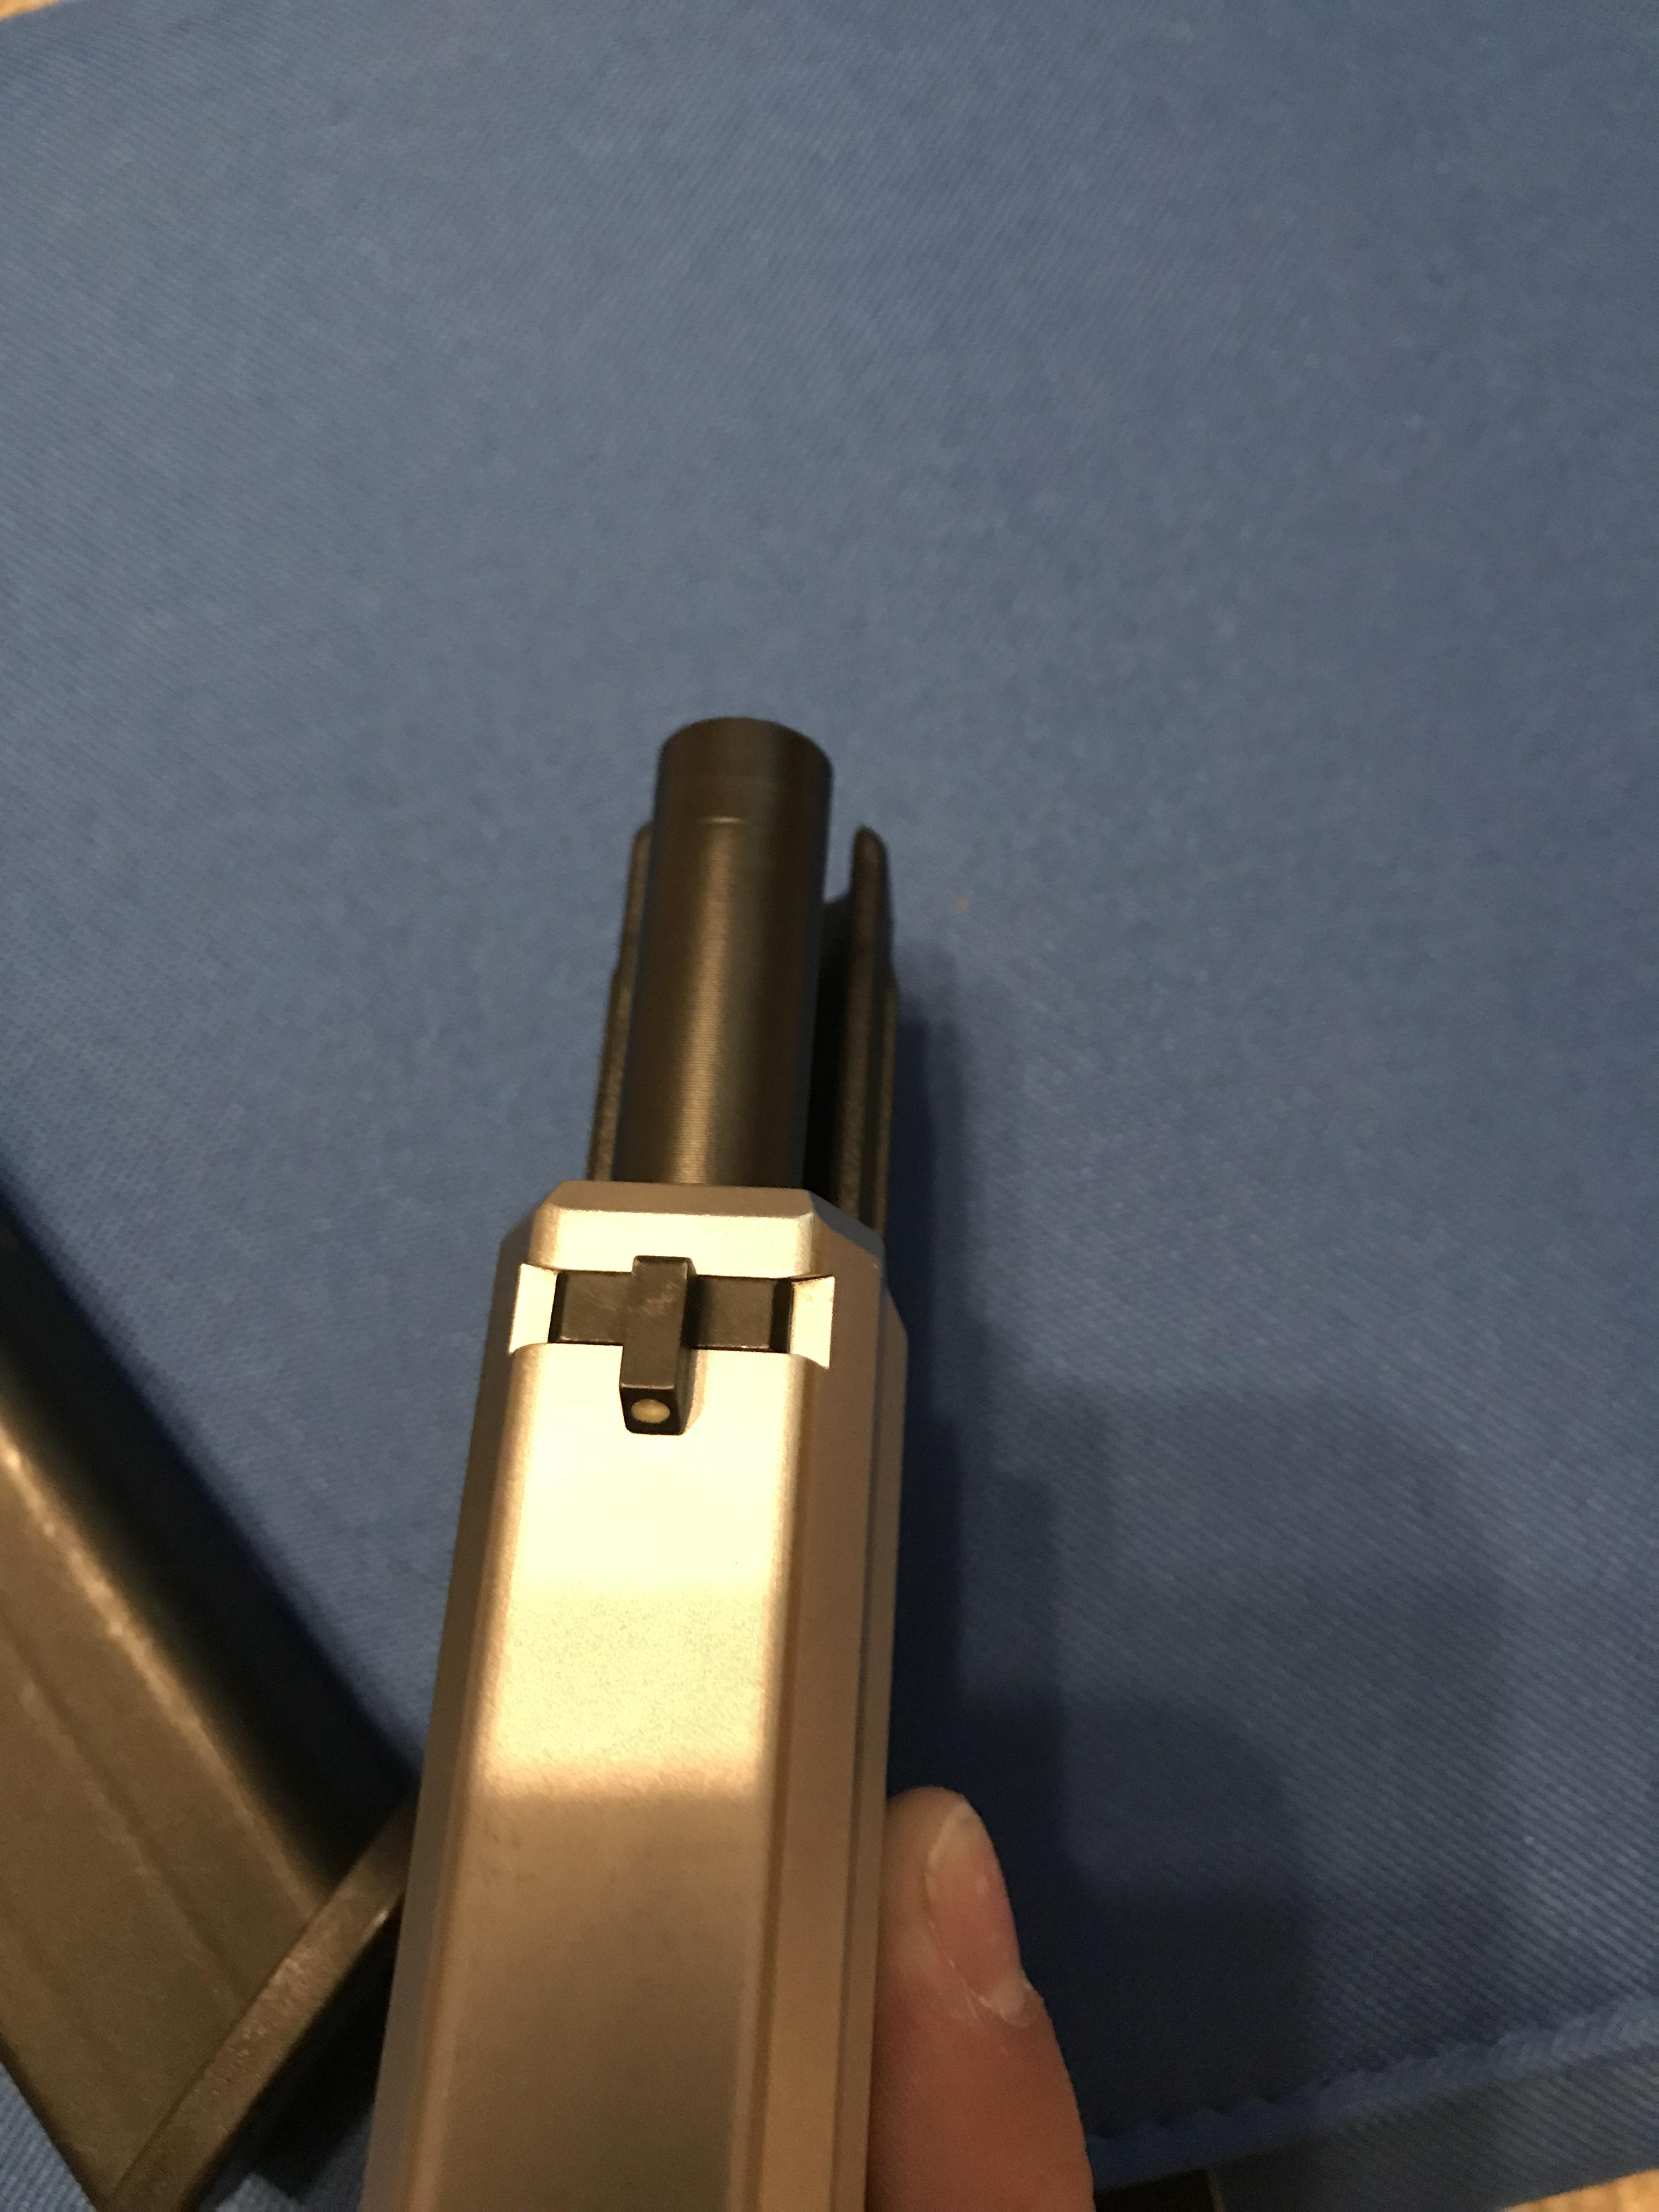 HK USP stainless-da0bb864-8a07-43da-8f1d-041768b1dcd8_1523097575978.jpeg